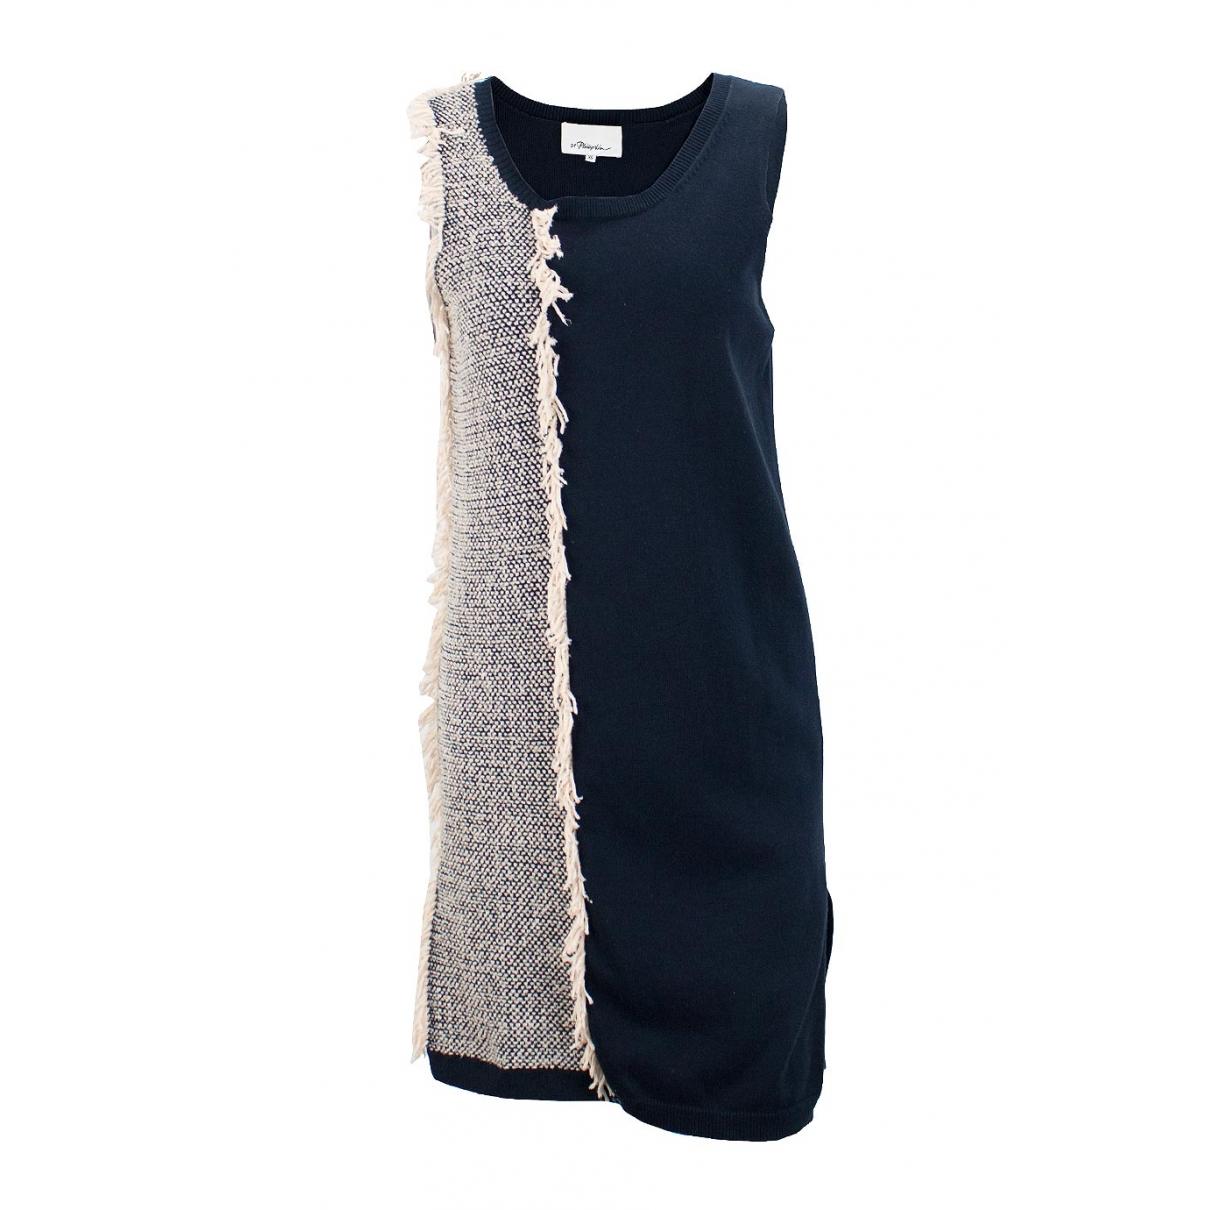 Vestido 3.1 Phillip Lim